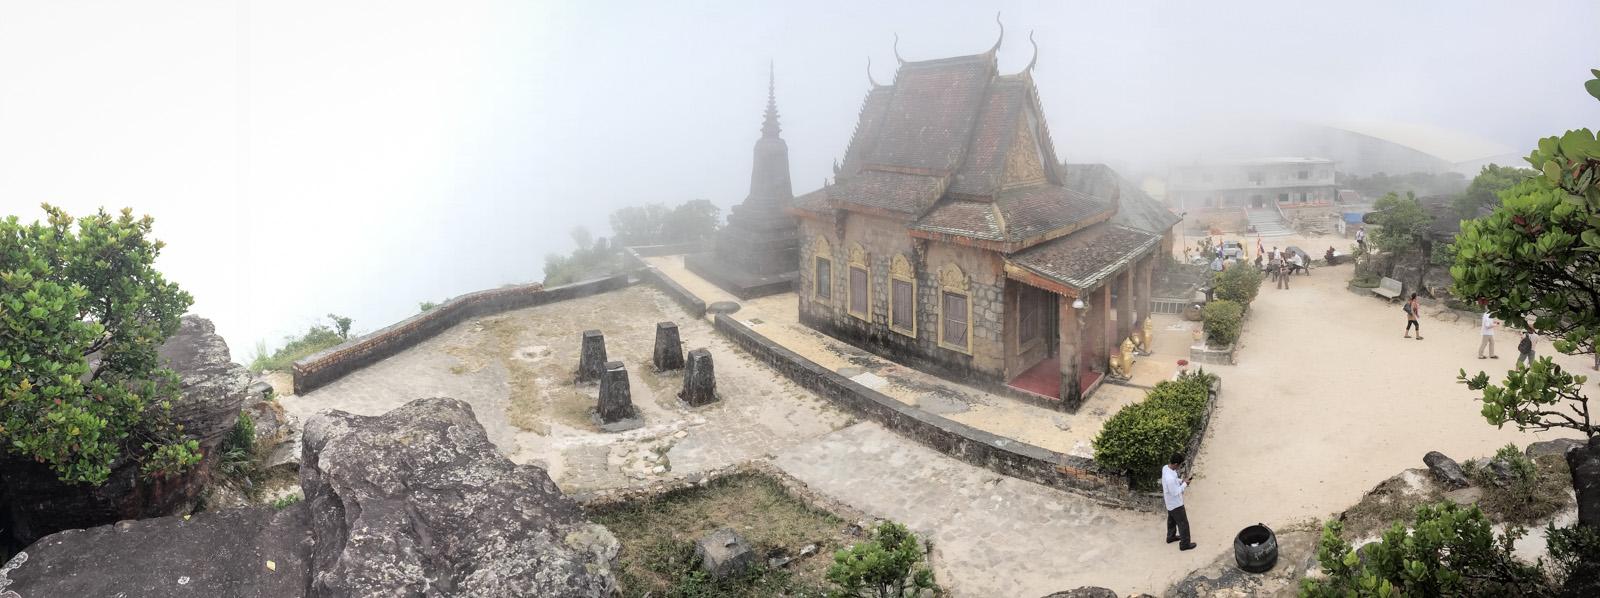 Kampot-Cambodia-AmyRolloPhoto-1345.jpg